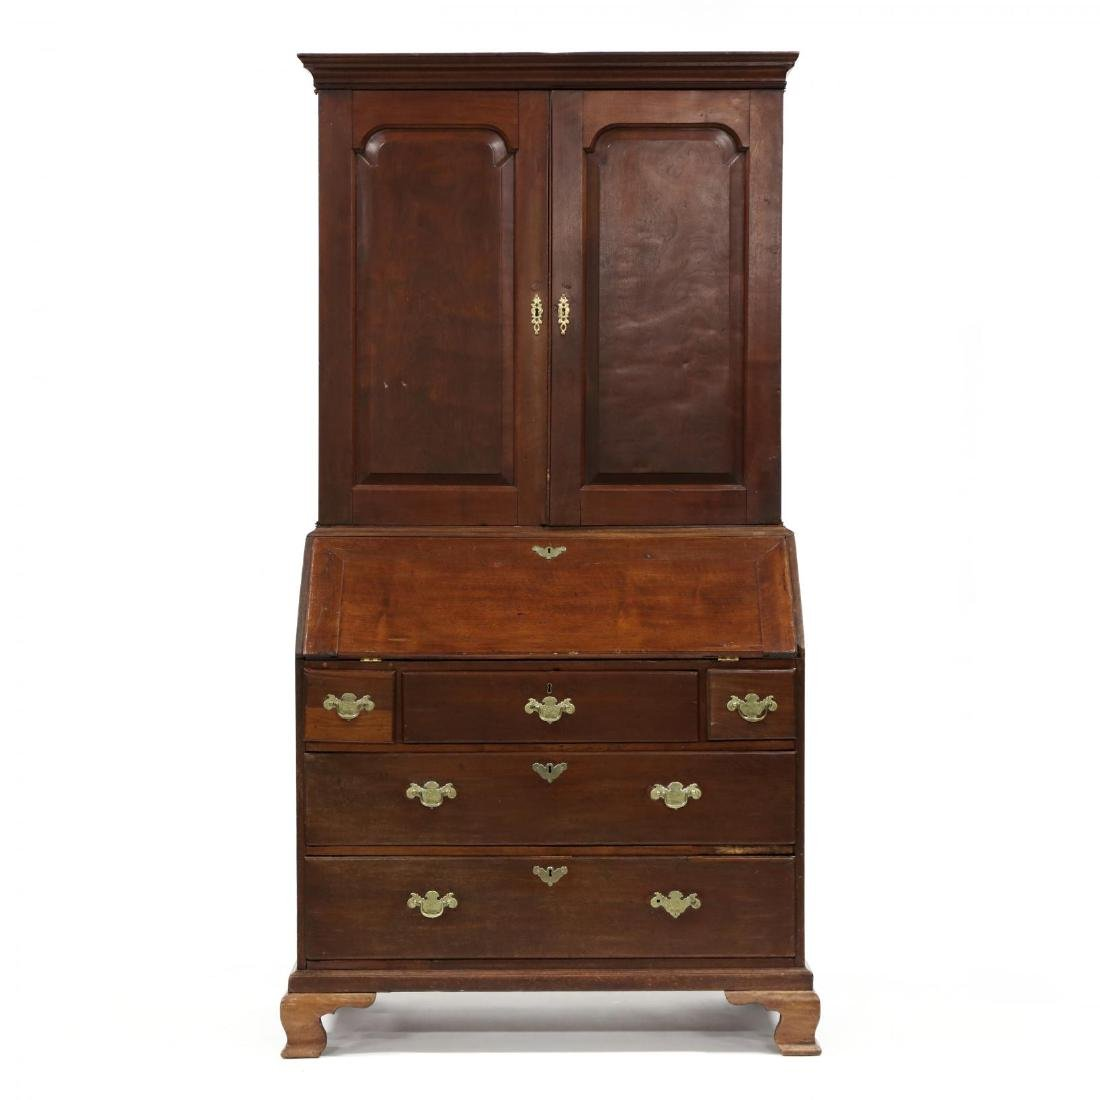 George III Walnut Secretary Bookcase